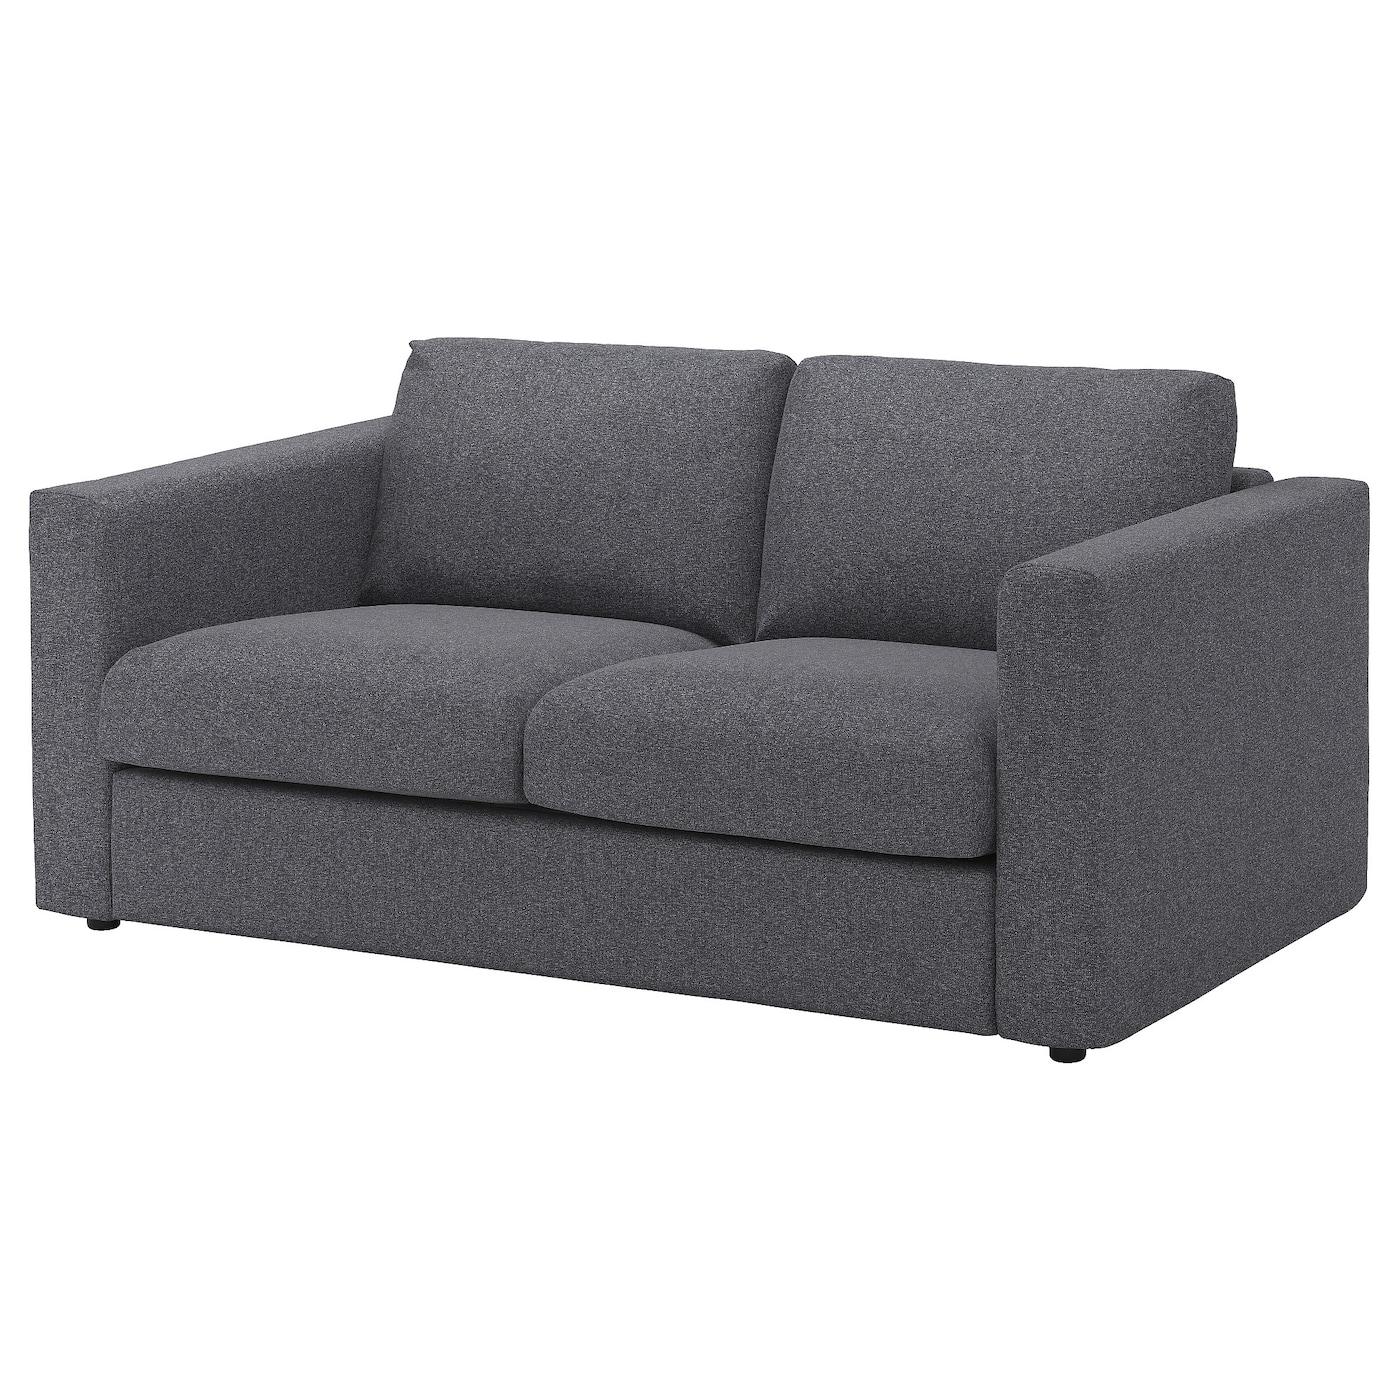 sofa grau pepe grau pepe chocolate with sofa grau best. Black Bedroom Furniture Sets. Home Design Ideas